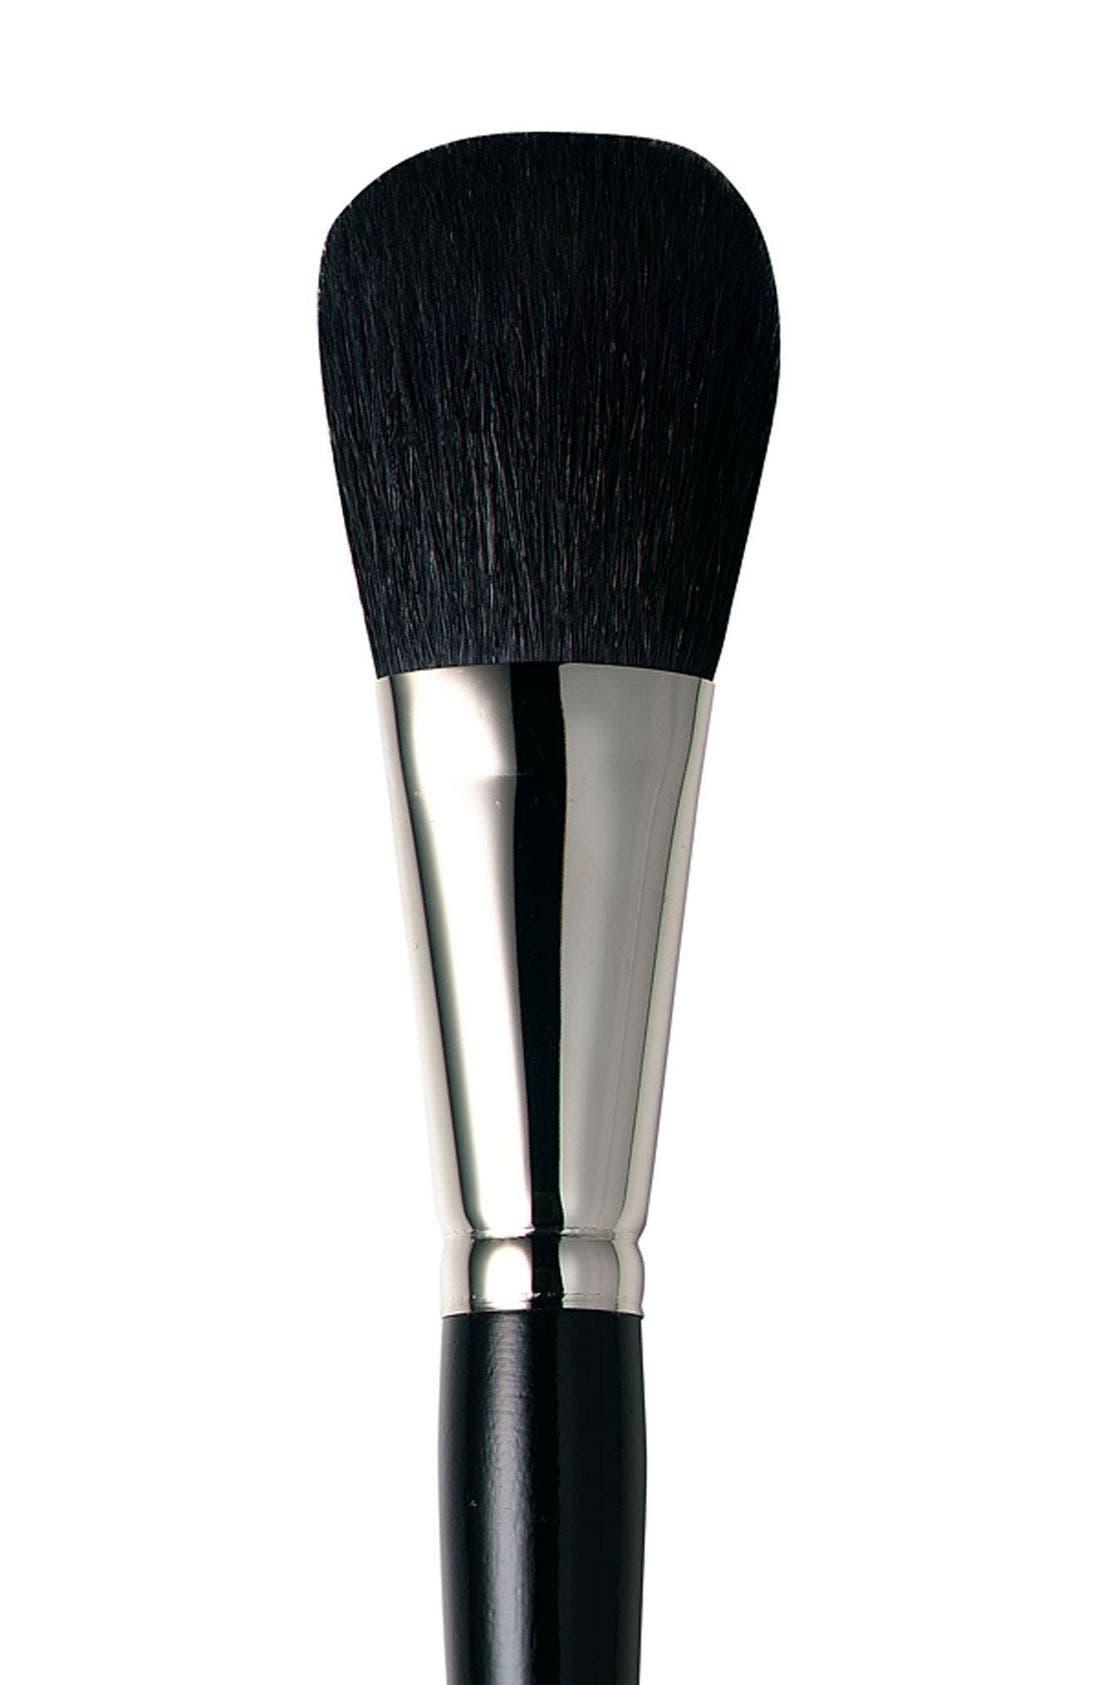 Loose Powder Brush - Travel,                         Main,                         color,